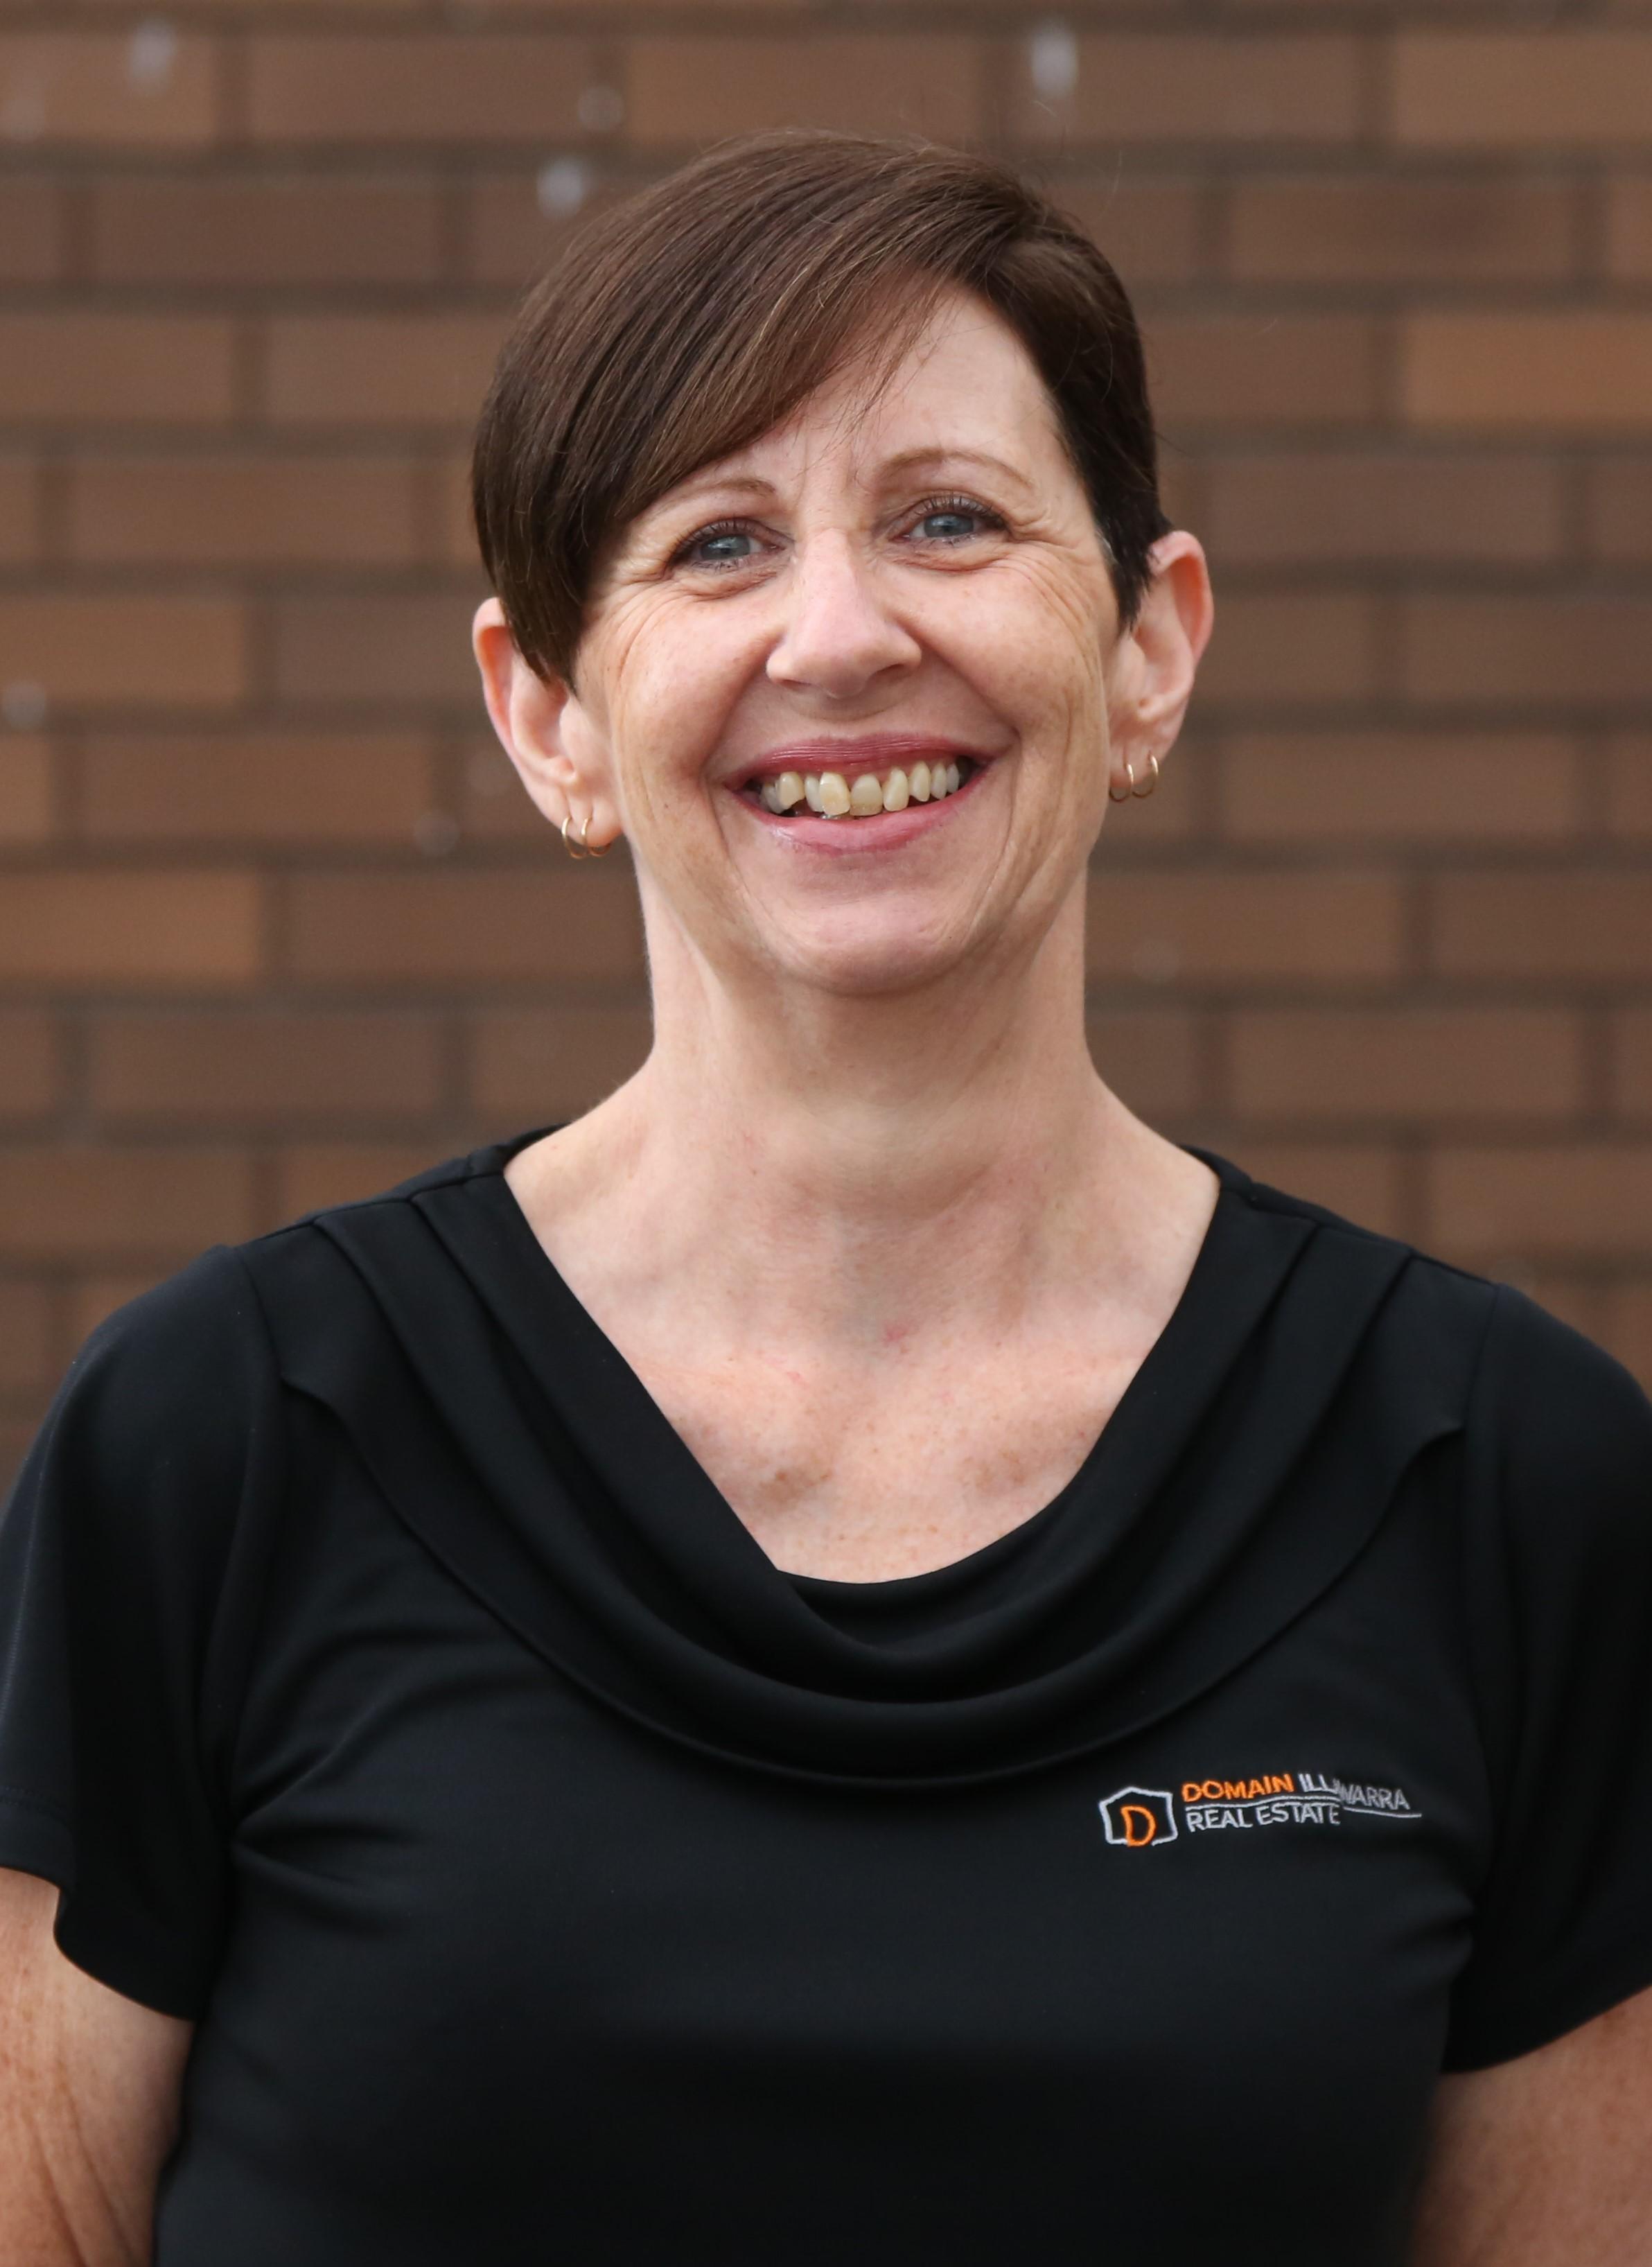 Gemma Ruddy